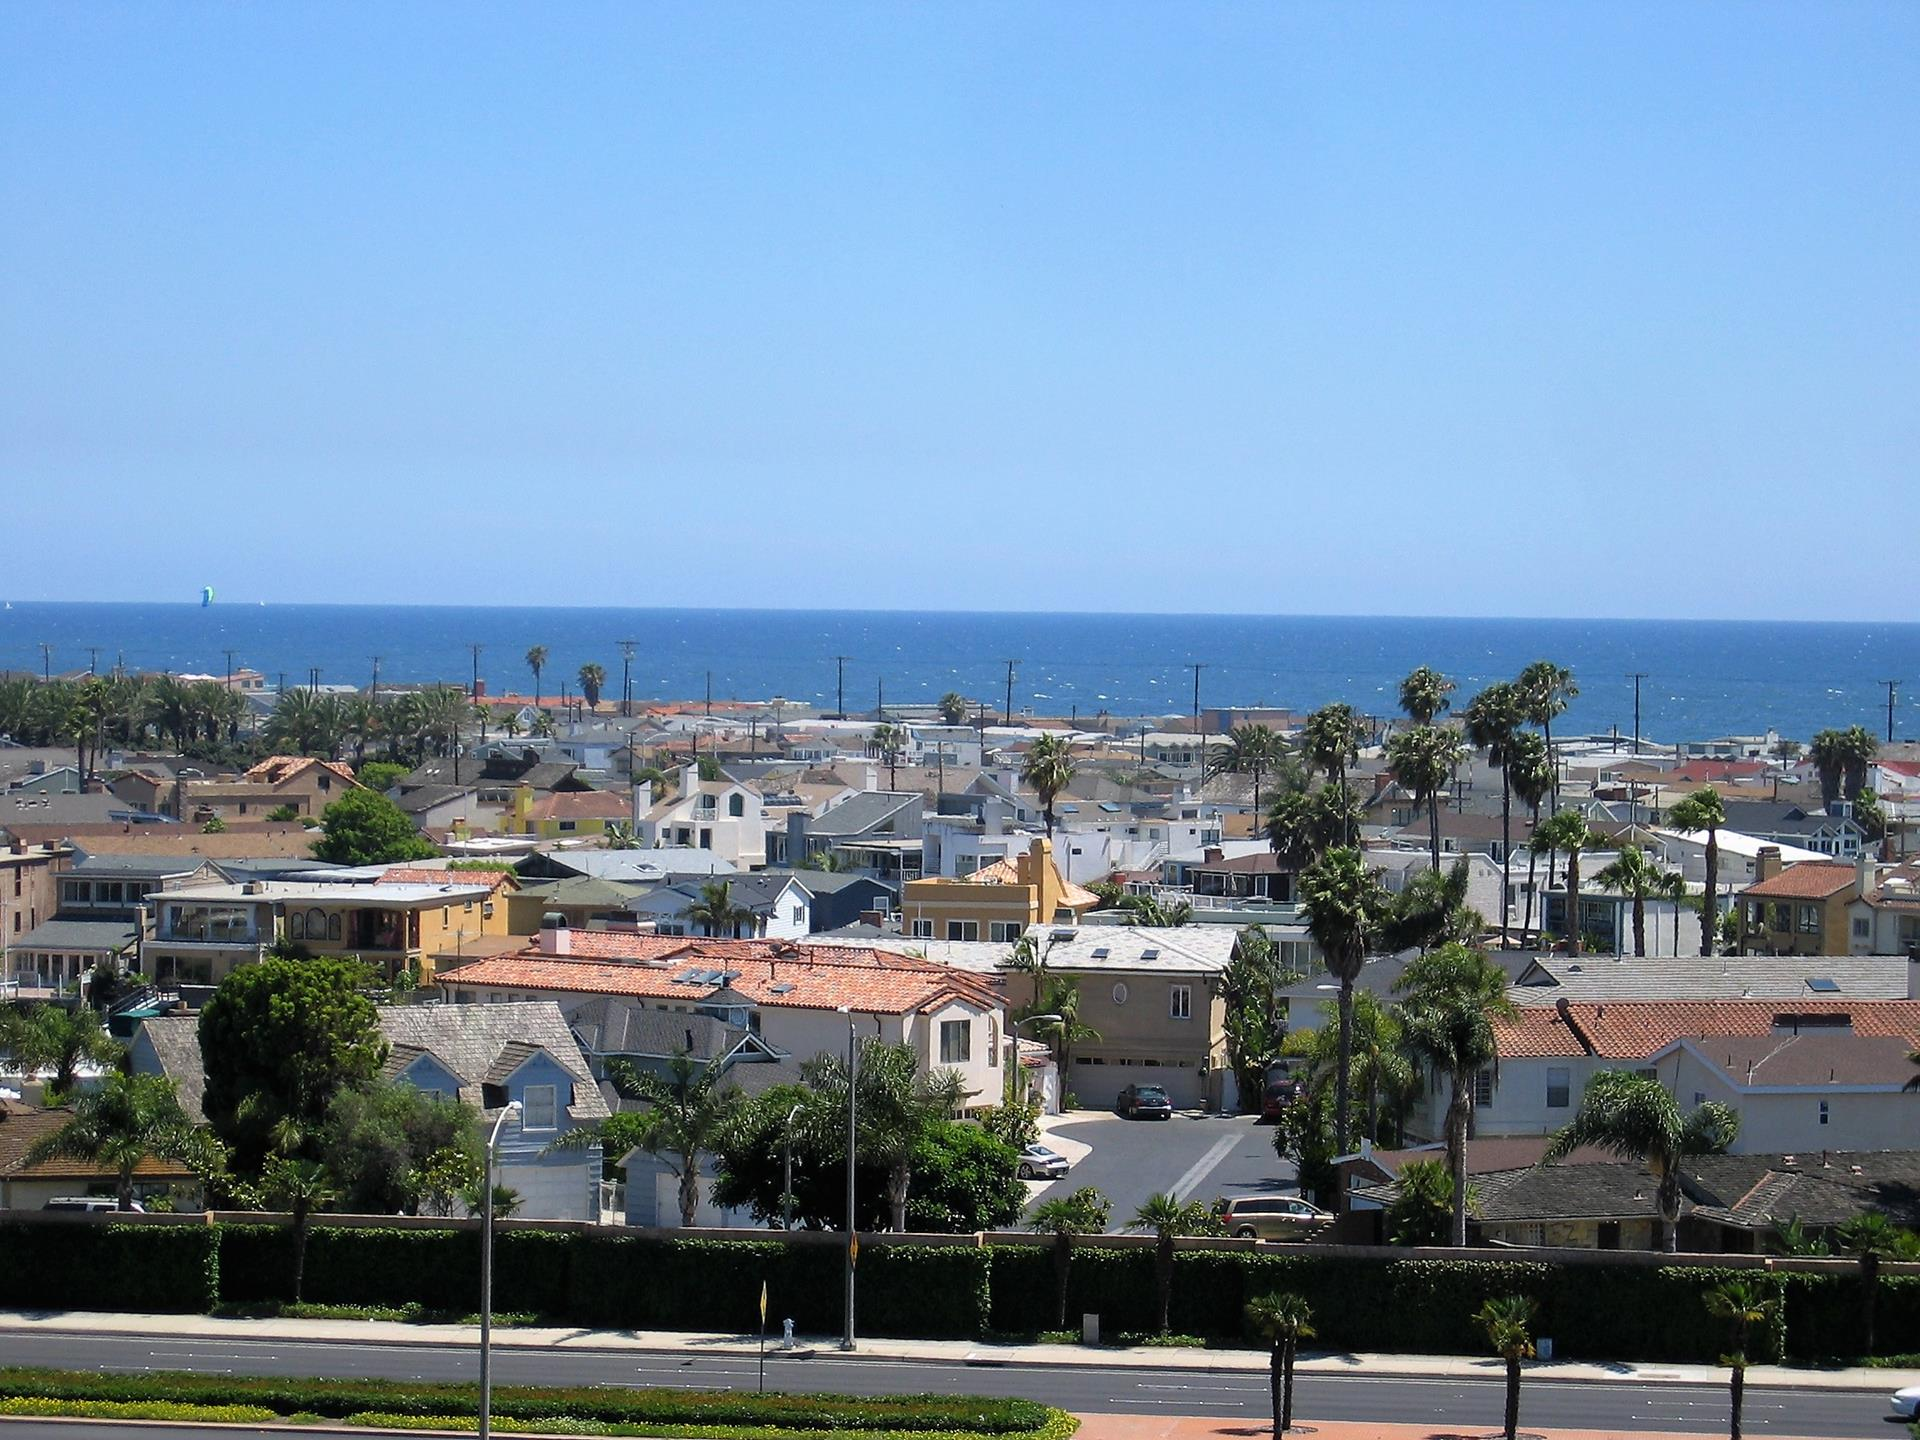 200 Paris Lane, 212 - Newport Heights, California